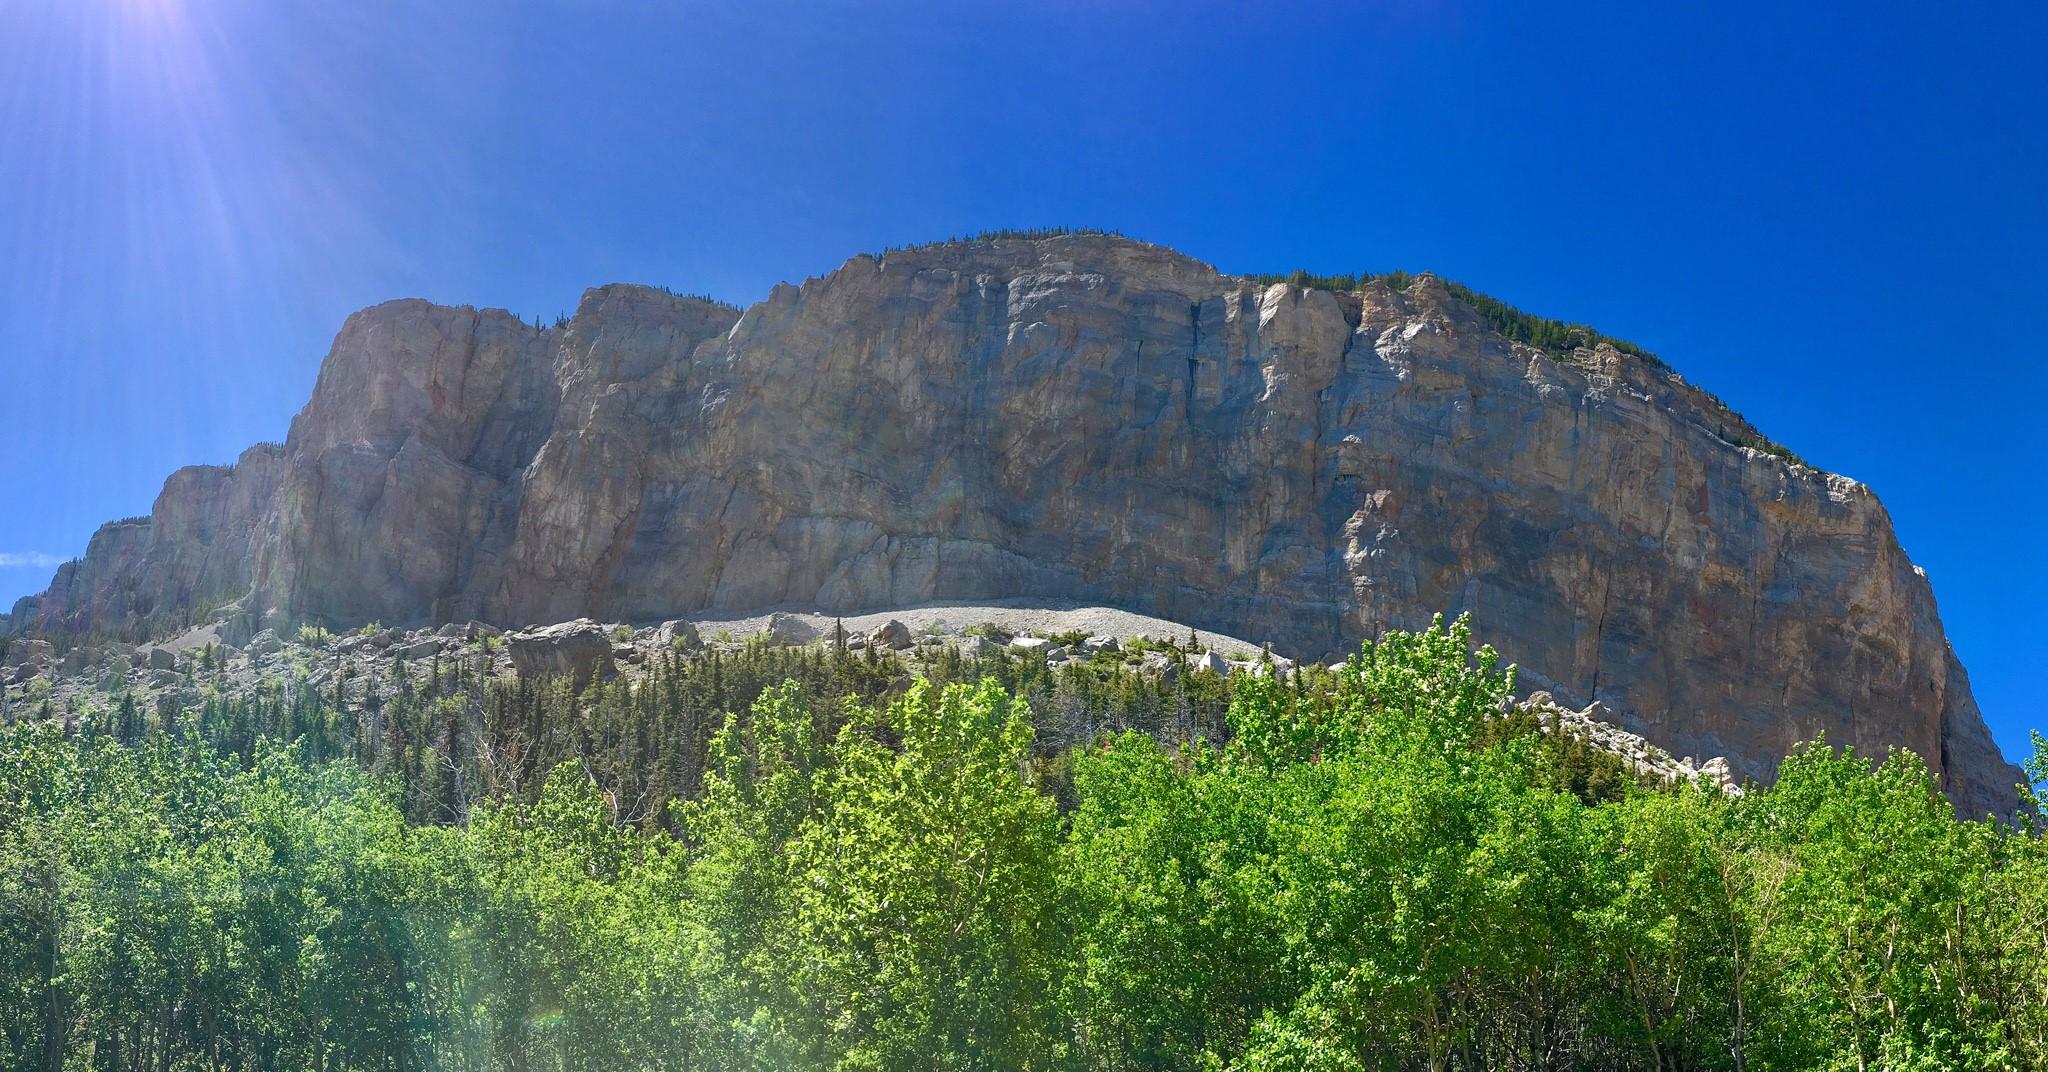 Walk amidst breathtaking scenery in Blackleaf Canyon in the Bob Marshall Wilderness